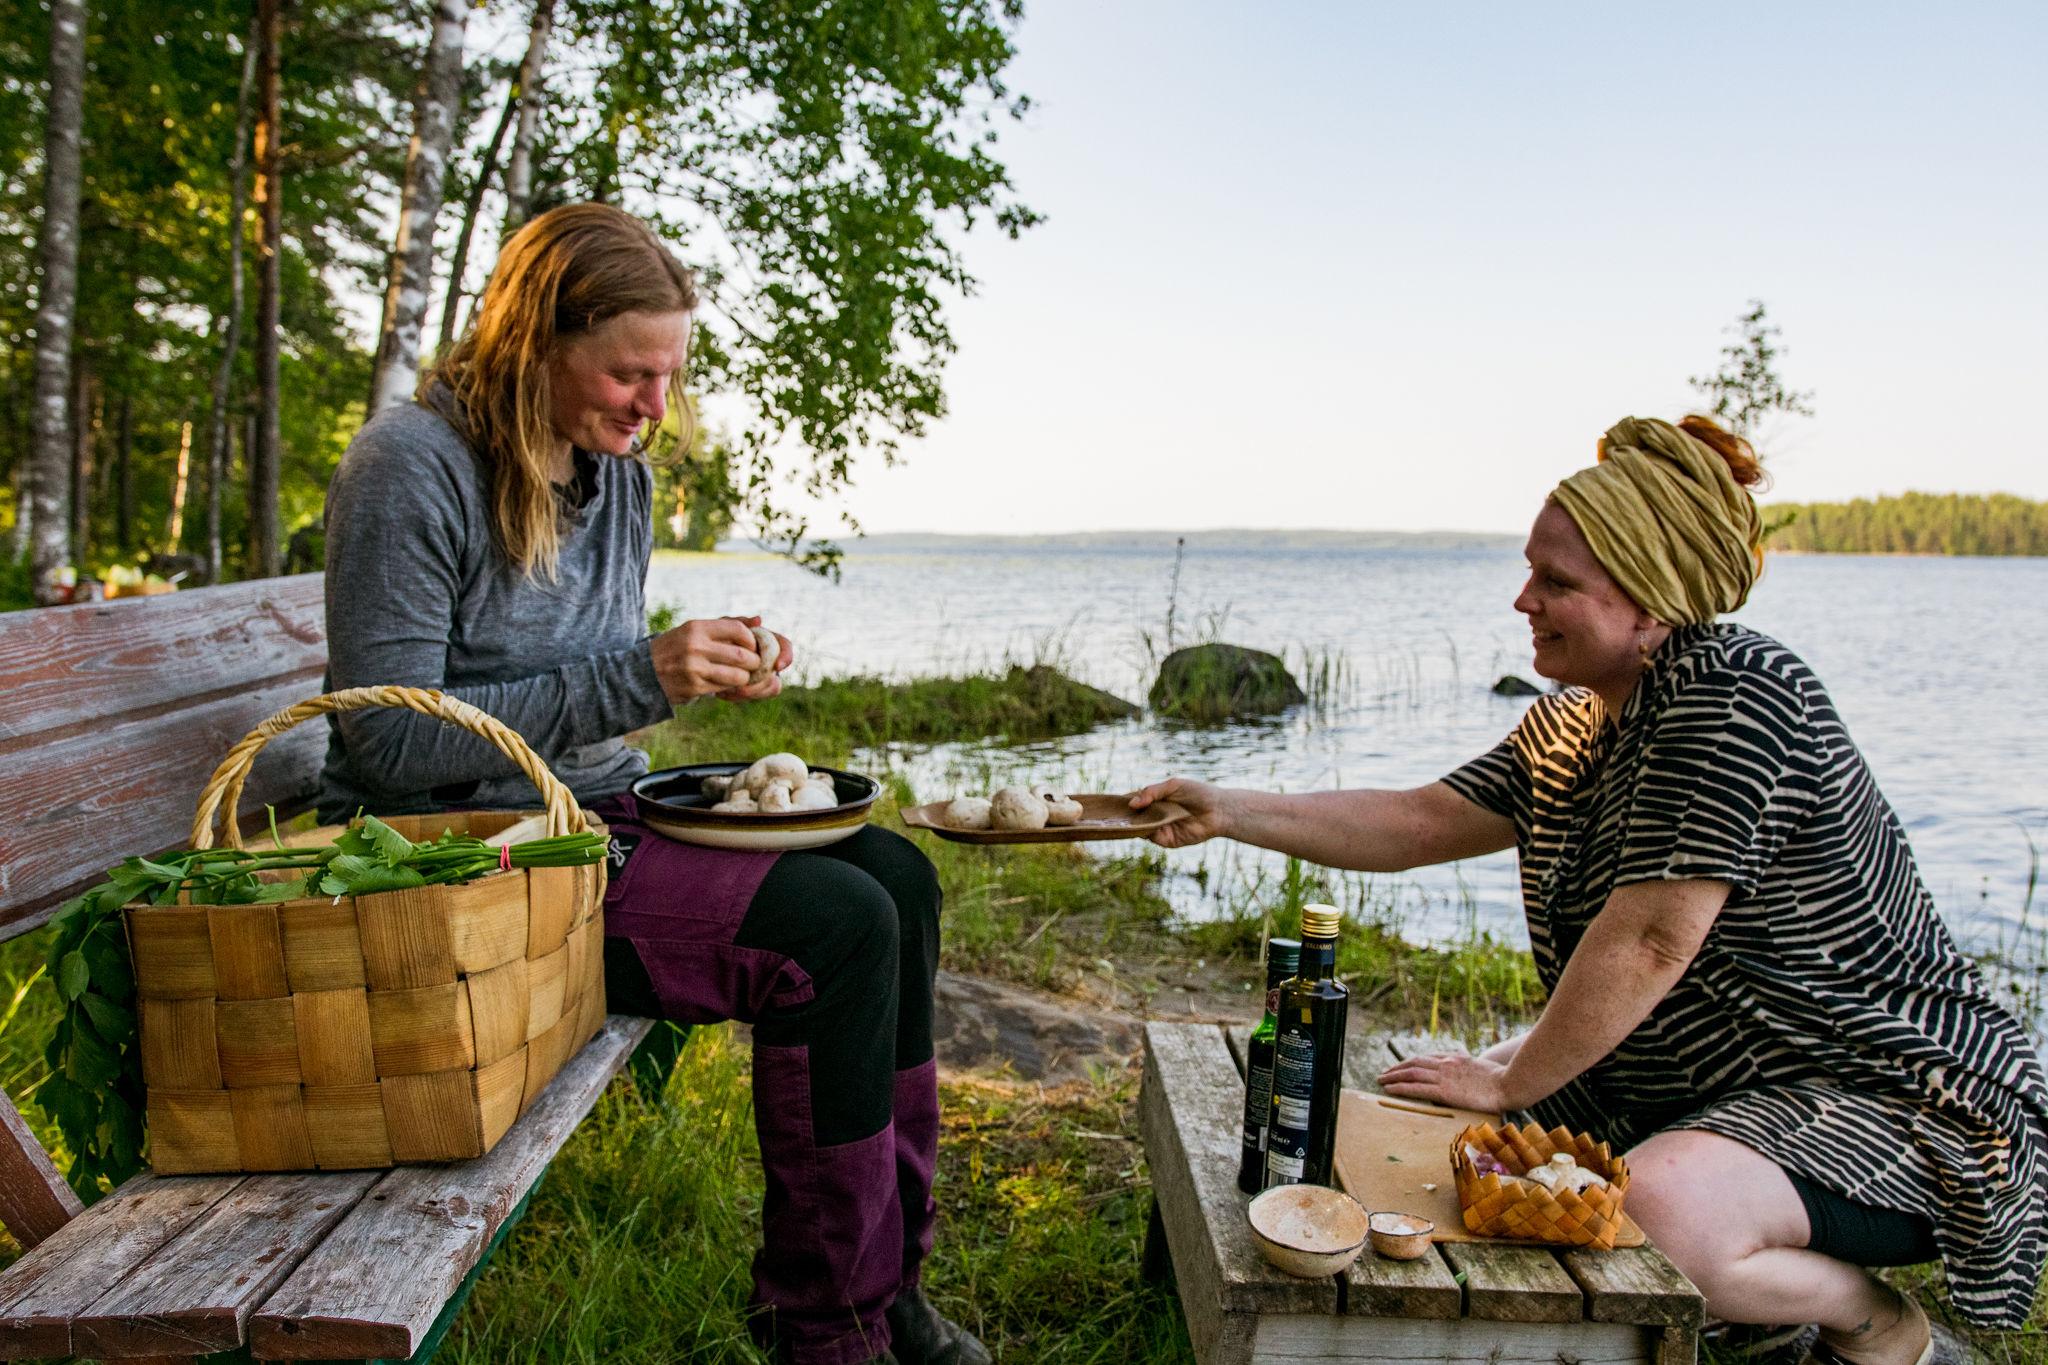 finnish women making saimaalife grilled mushroom skewers